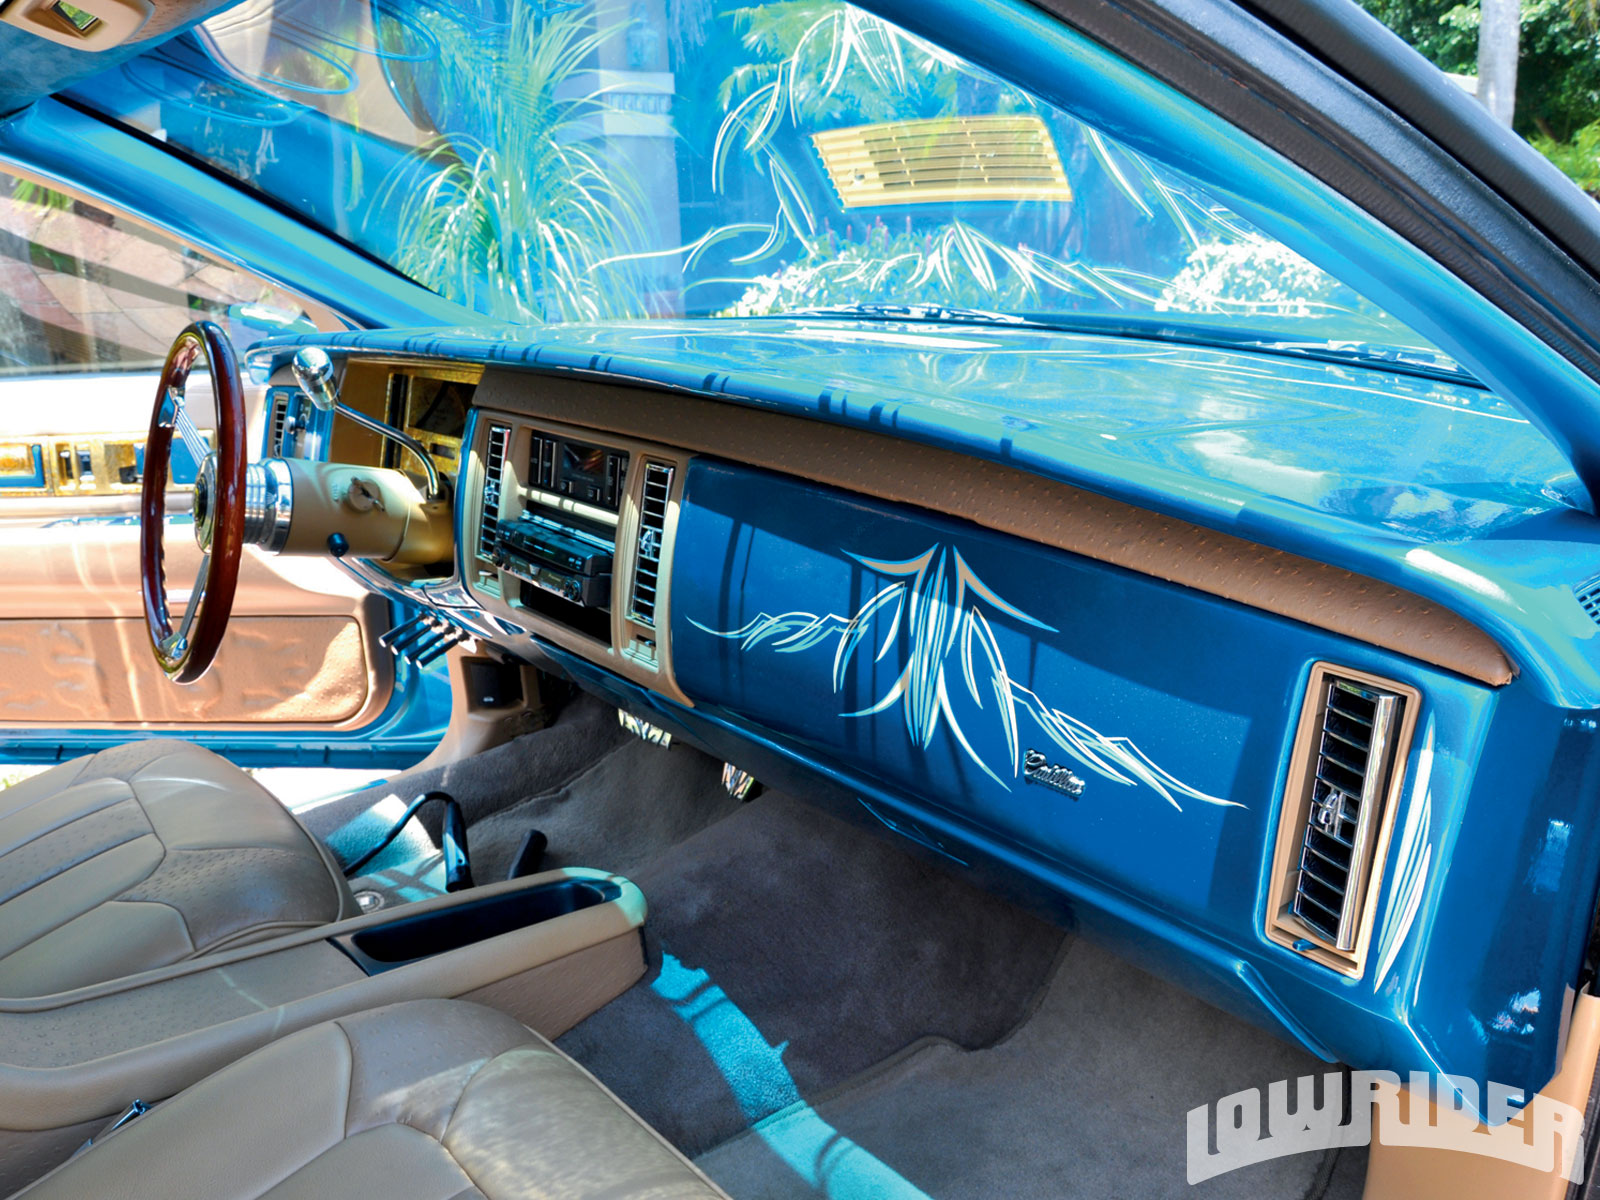 1993 Cadillac Fleetwood - Lowrider Magazine